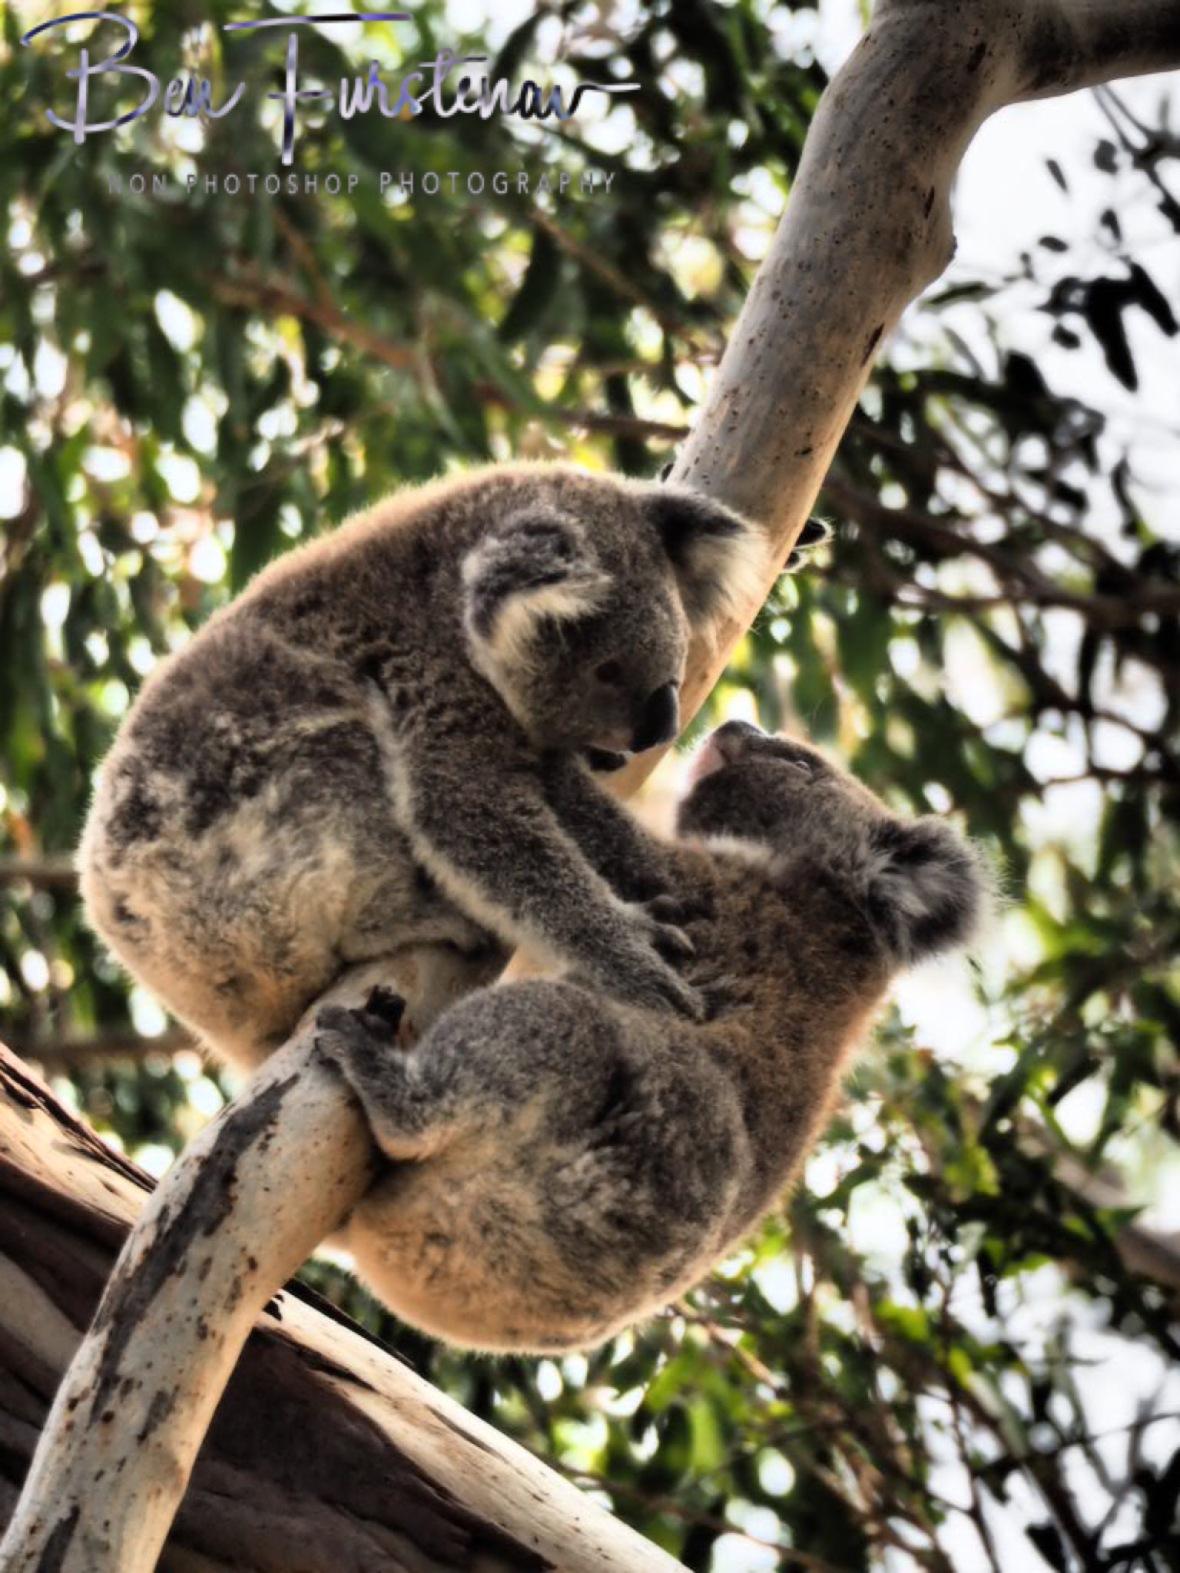 Helping paws at Woodburn, Northern New South Wales, Australia